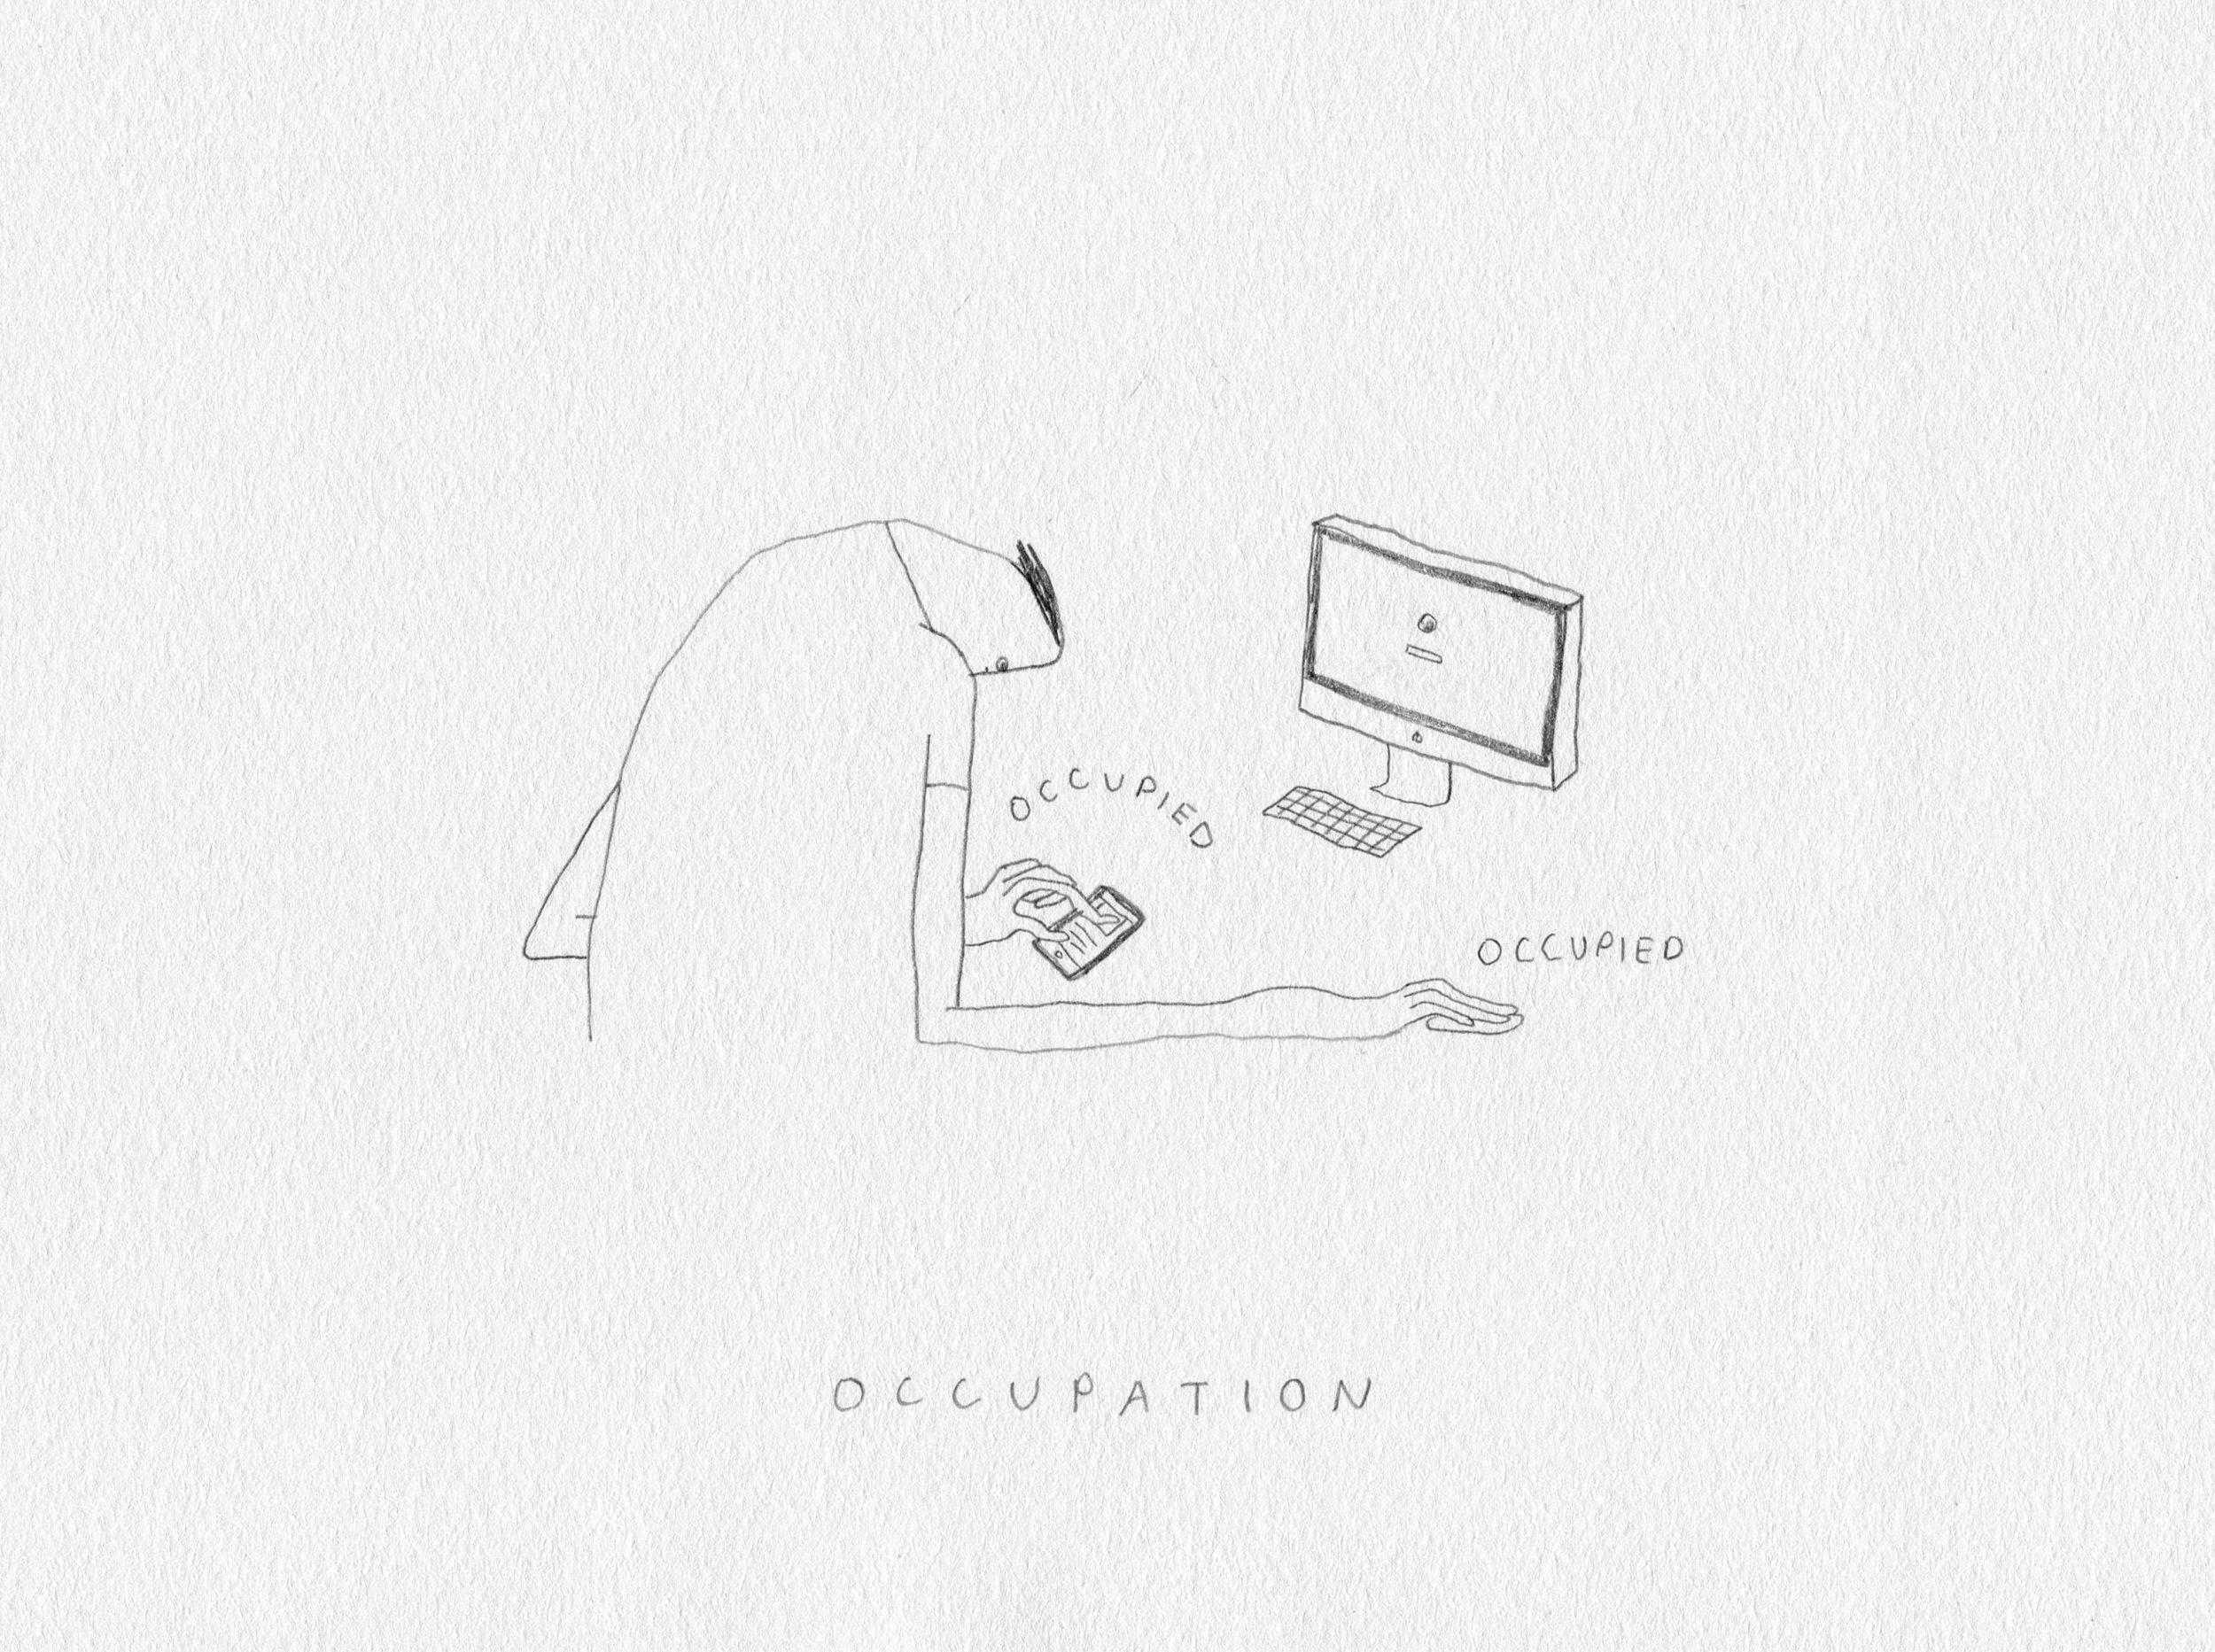 occupation003.jpg